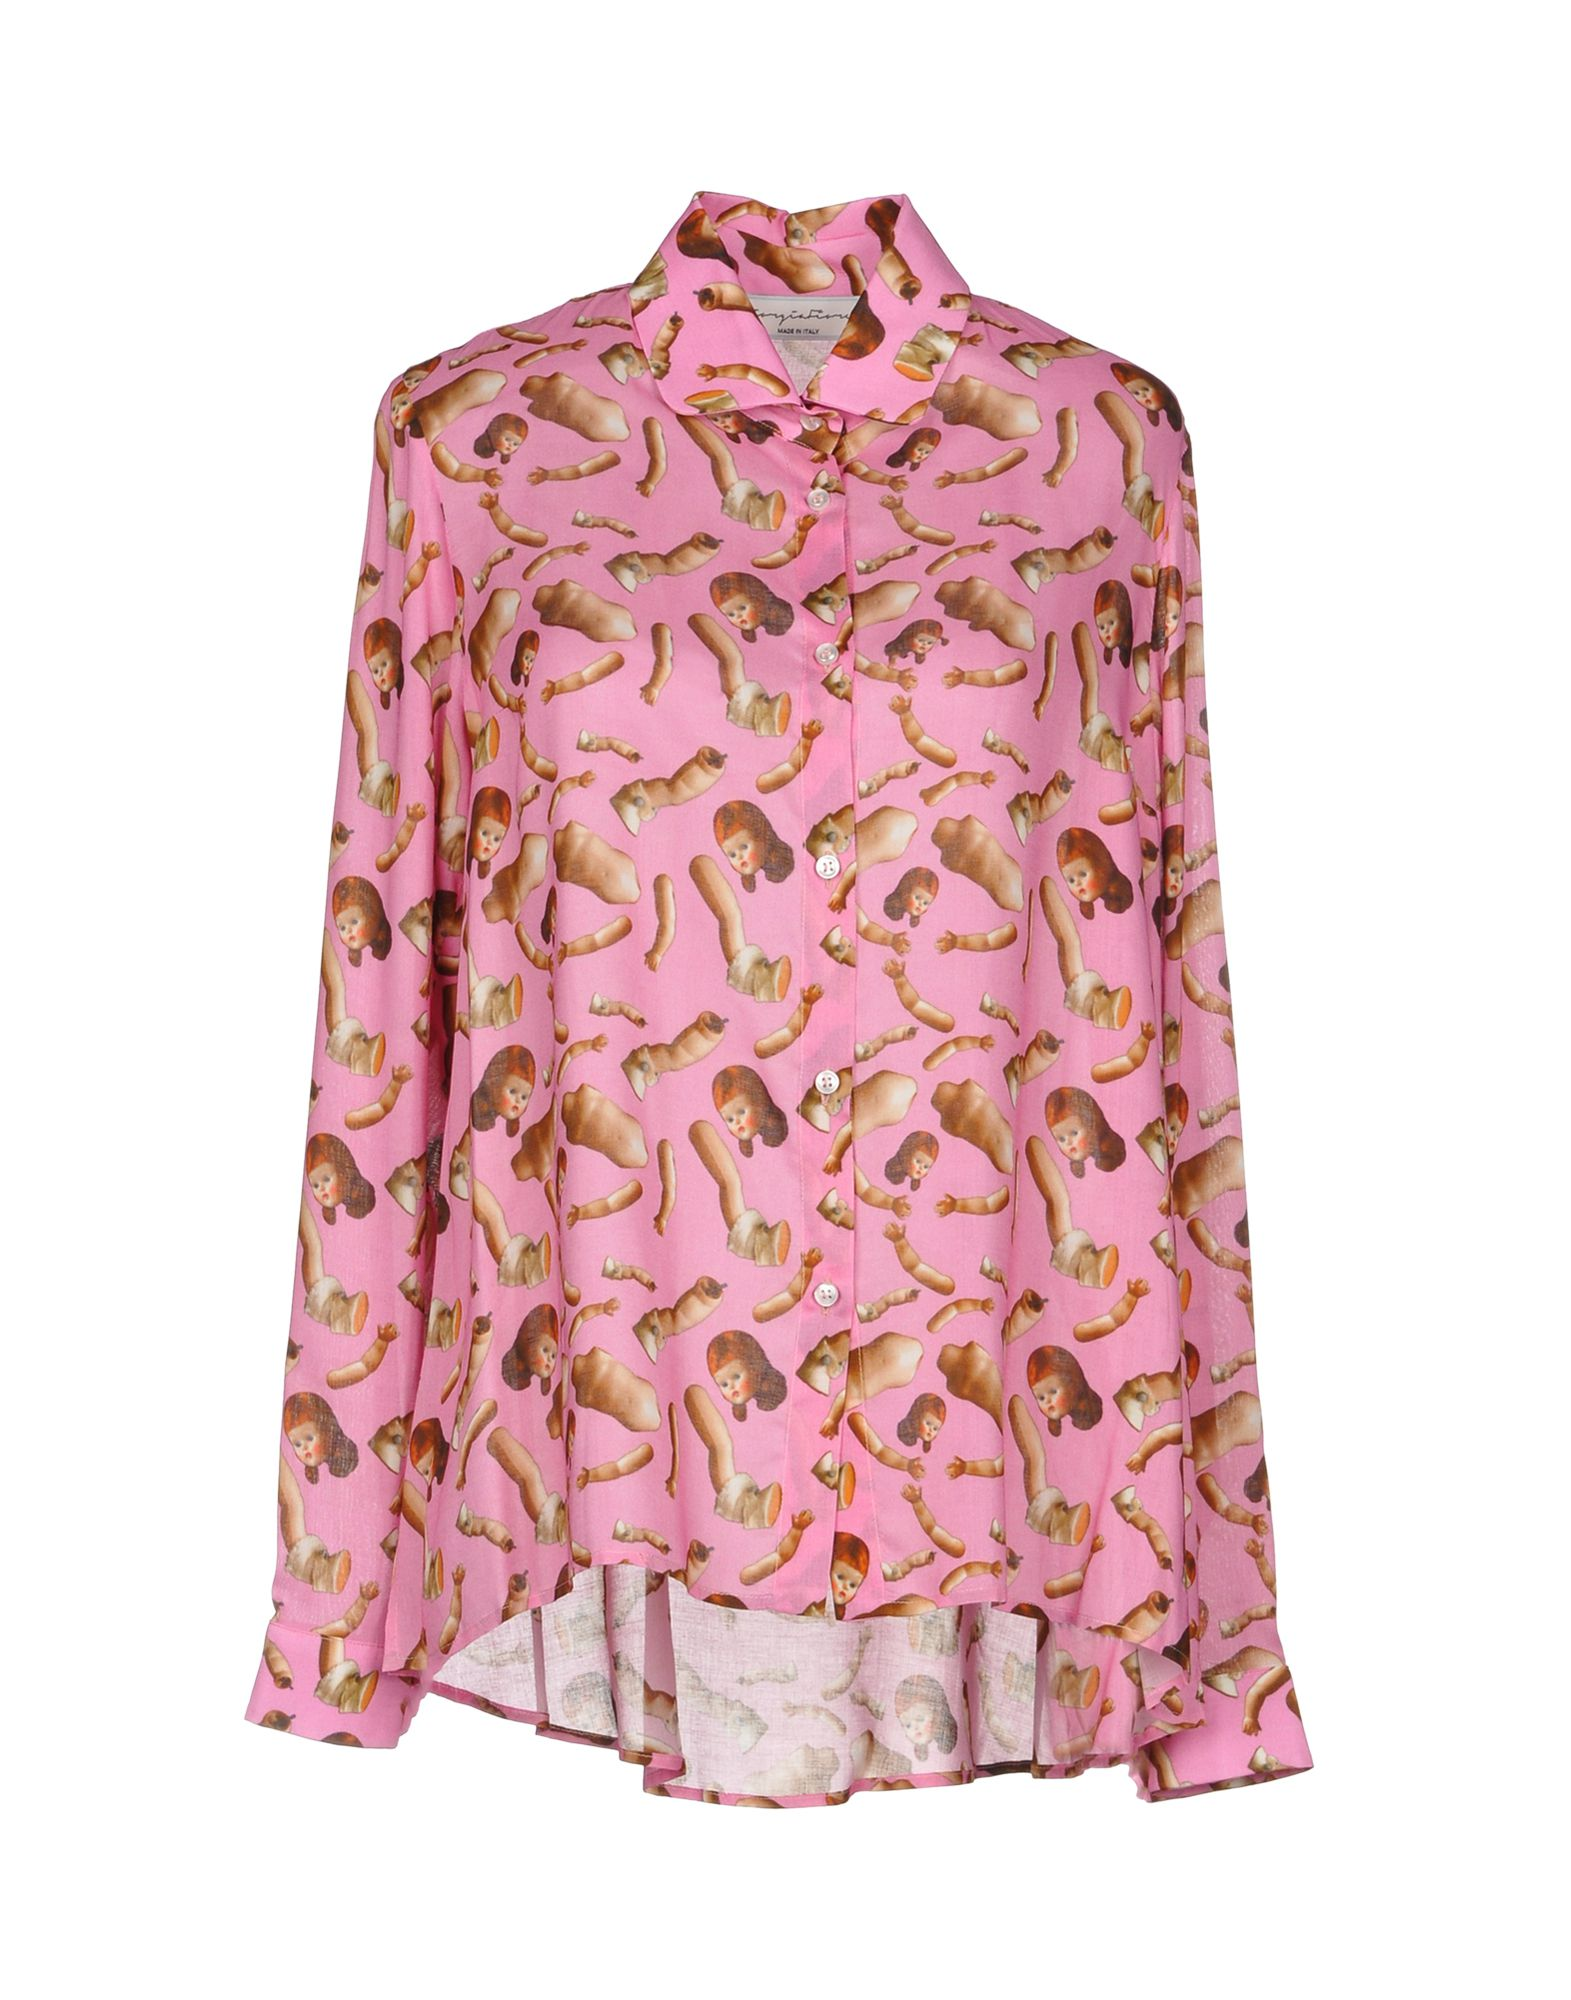 GIORGIA FIORE Patterned Shirts & Blouses in Fuchsia